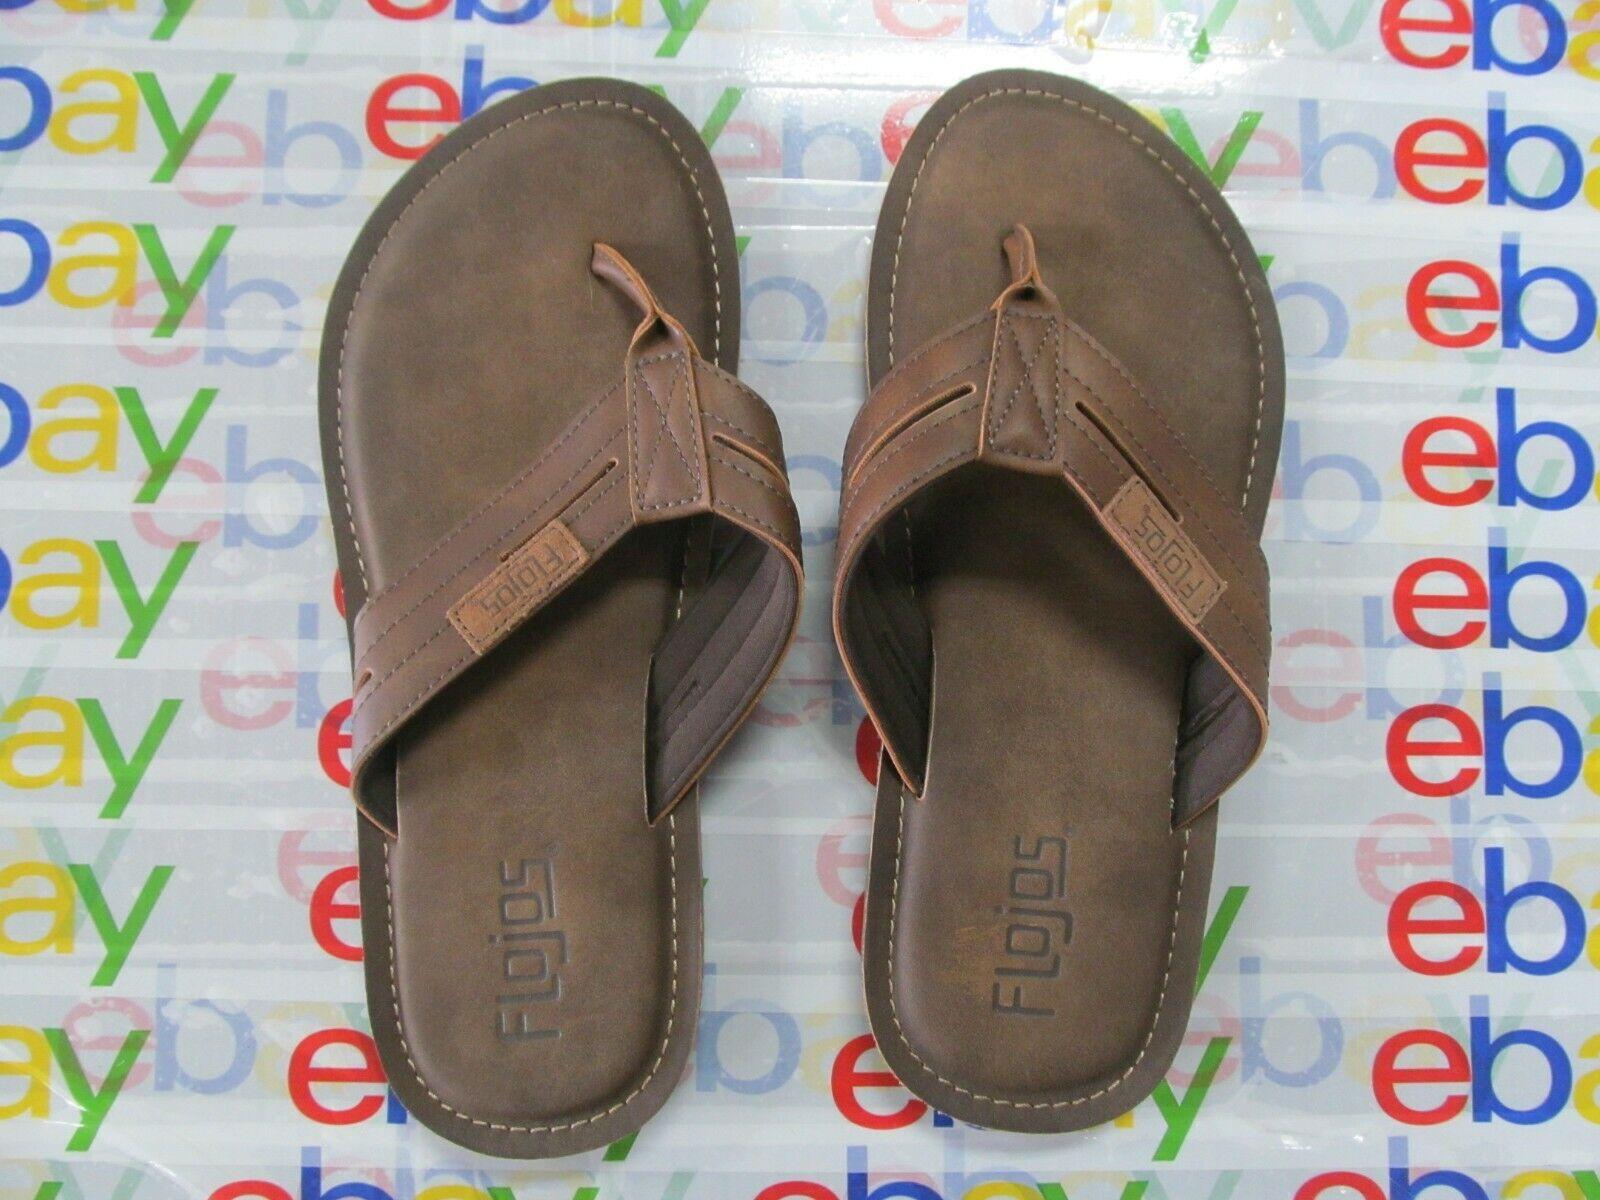 Flojos Men's Flip Flop, Tan, Size 8